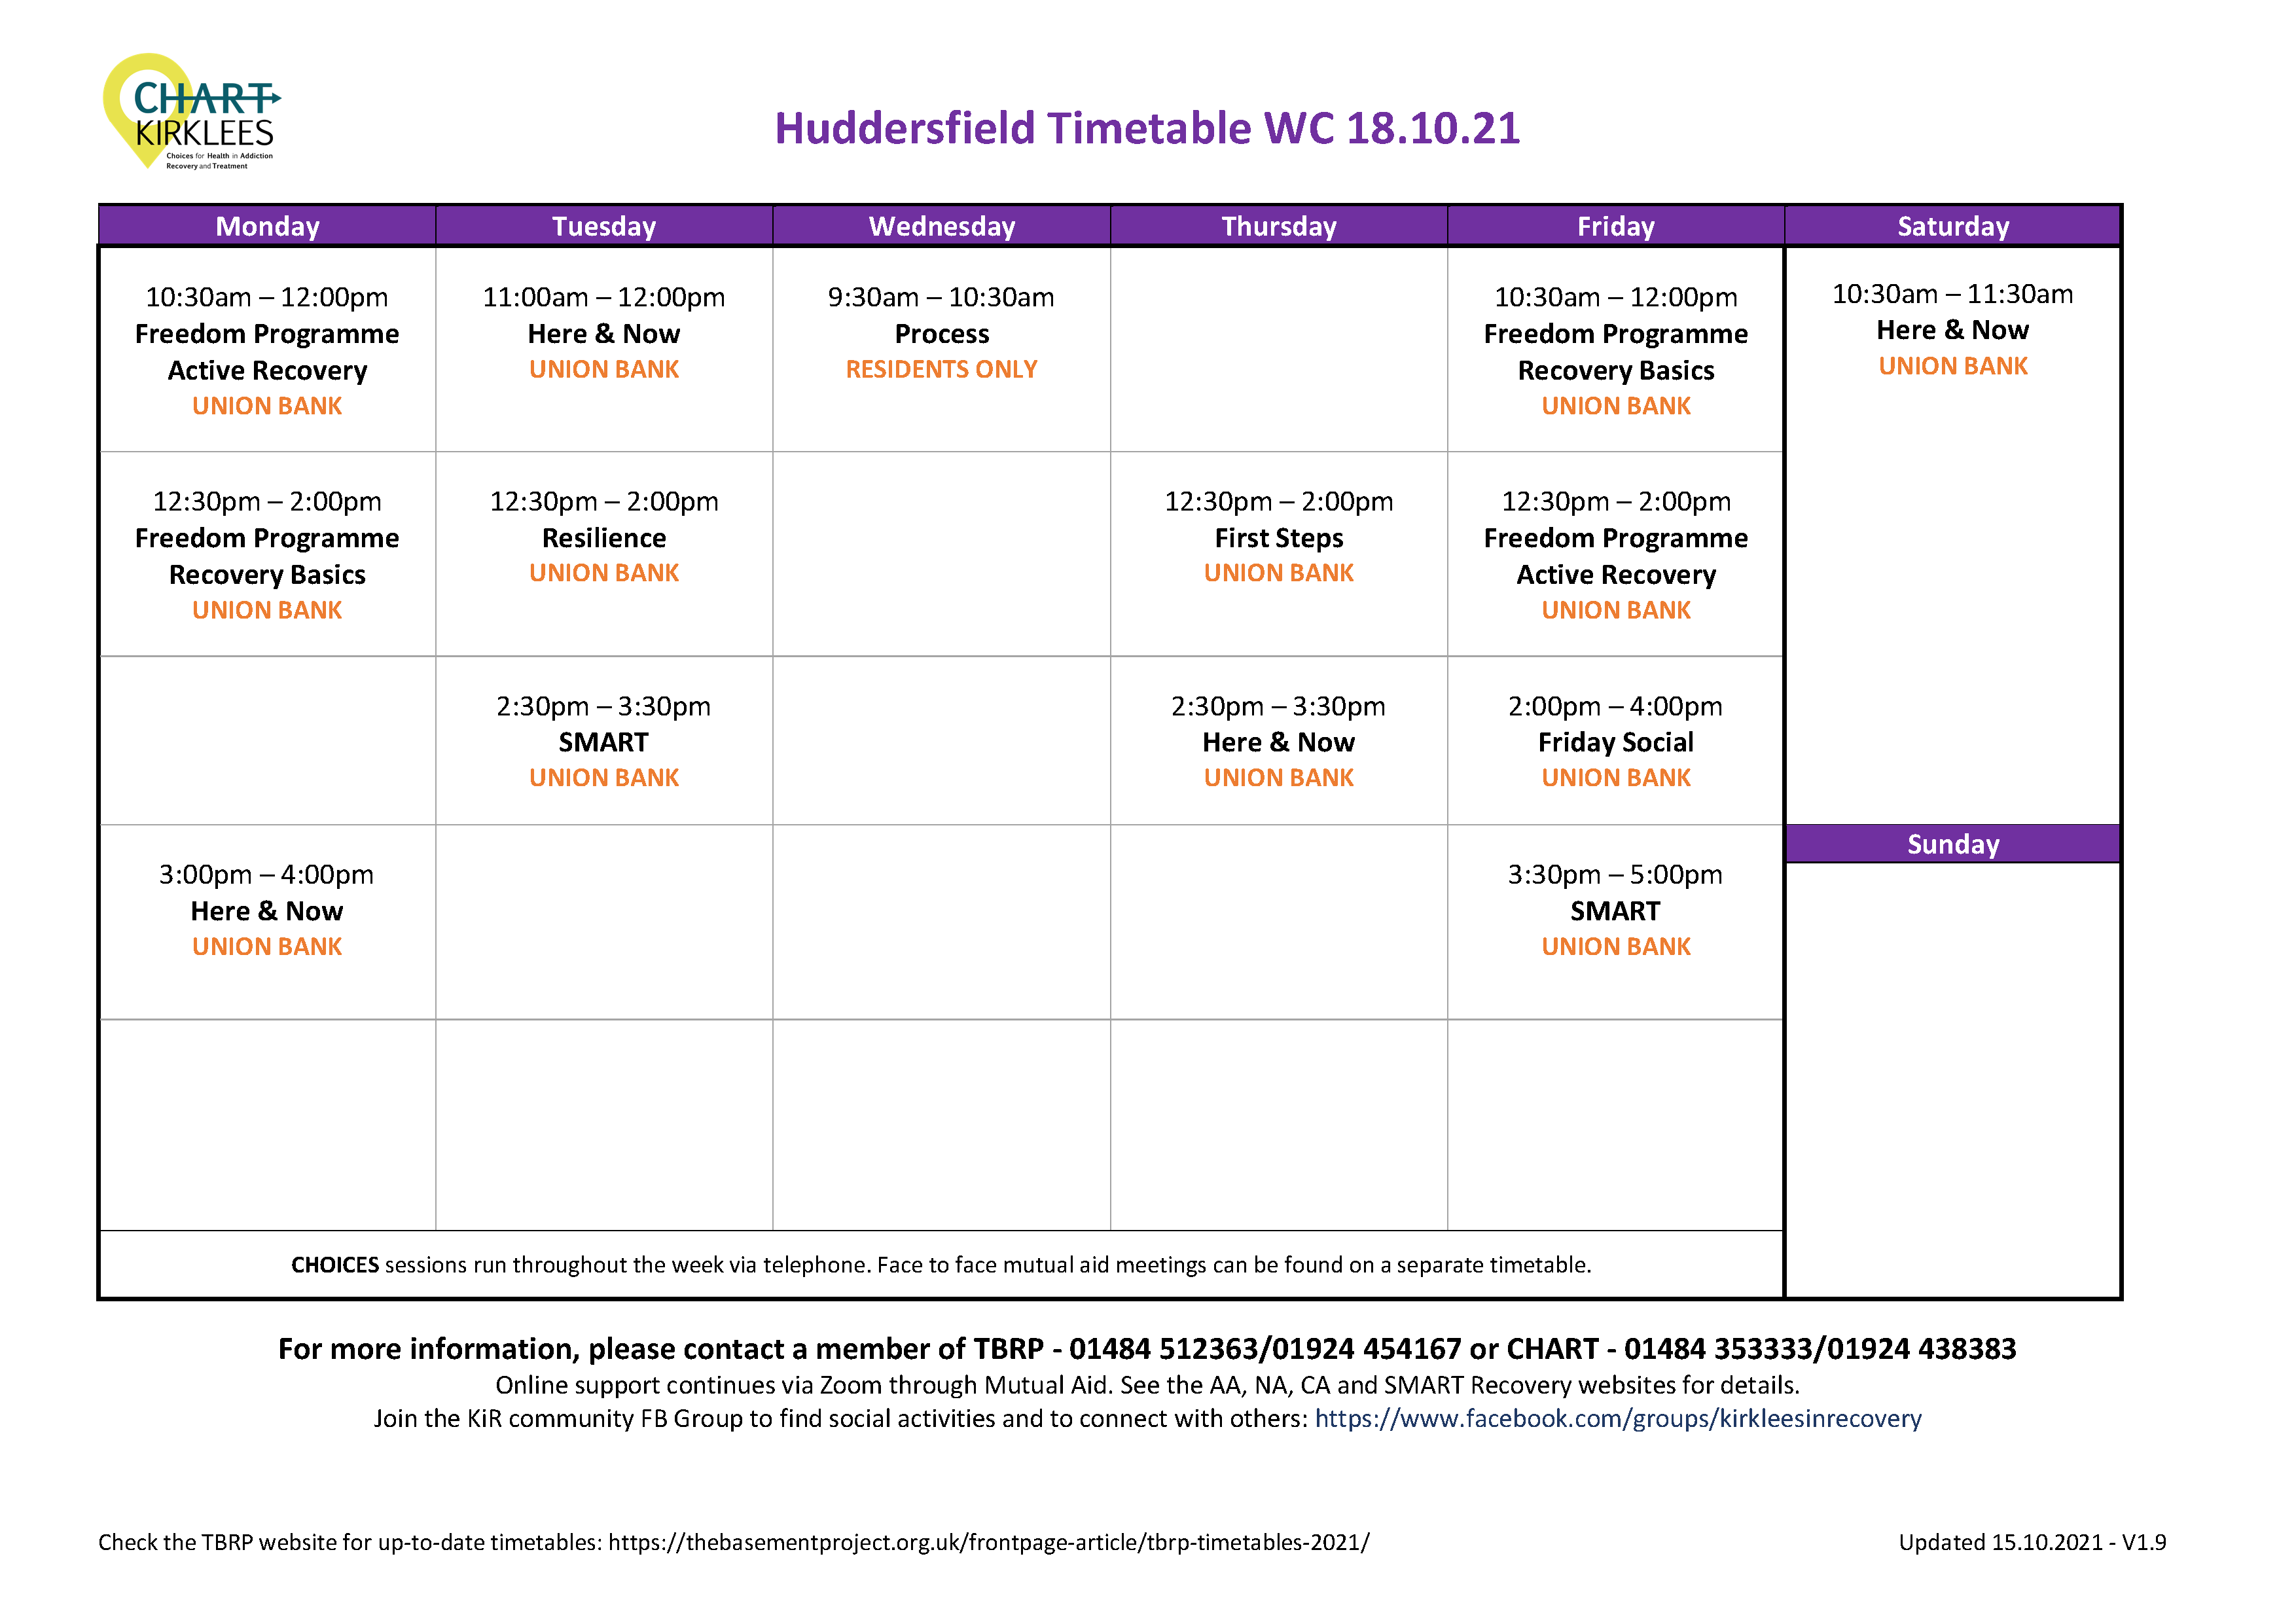 CHART Huddersfield Timetable